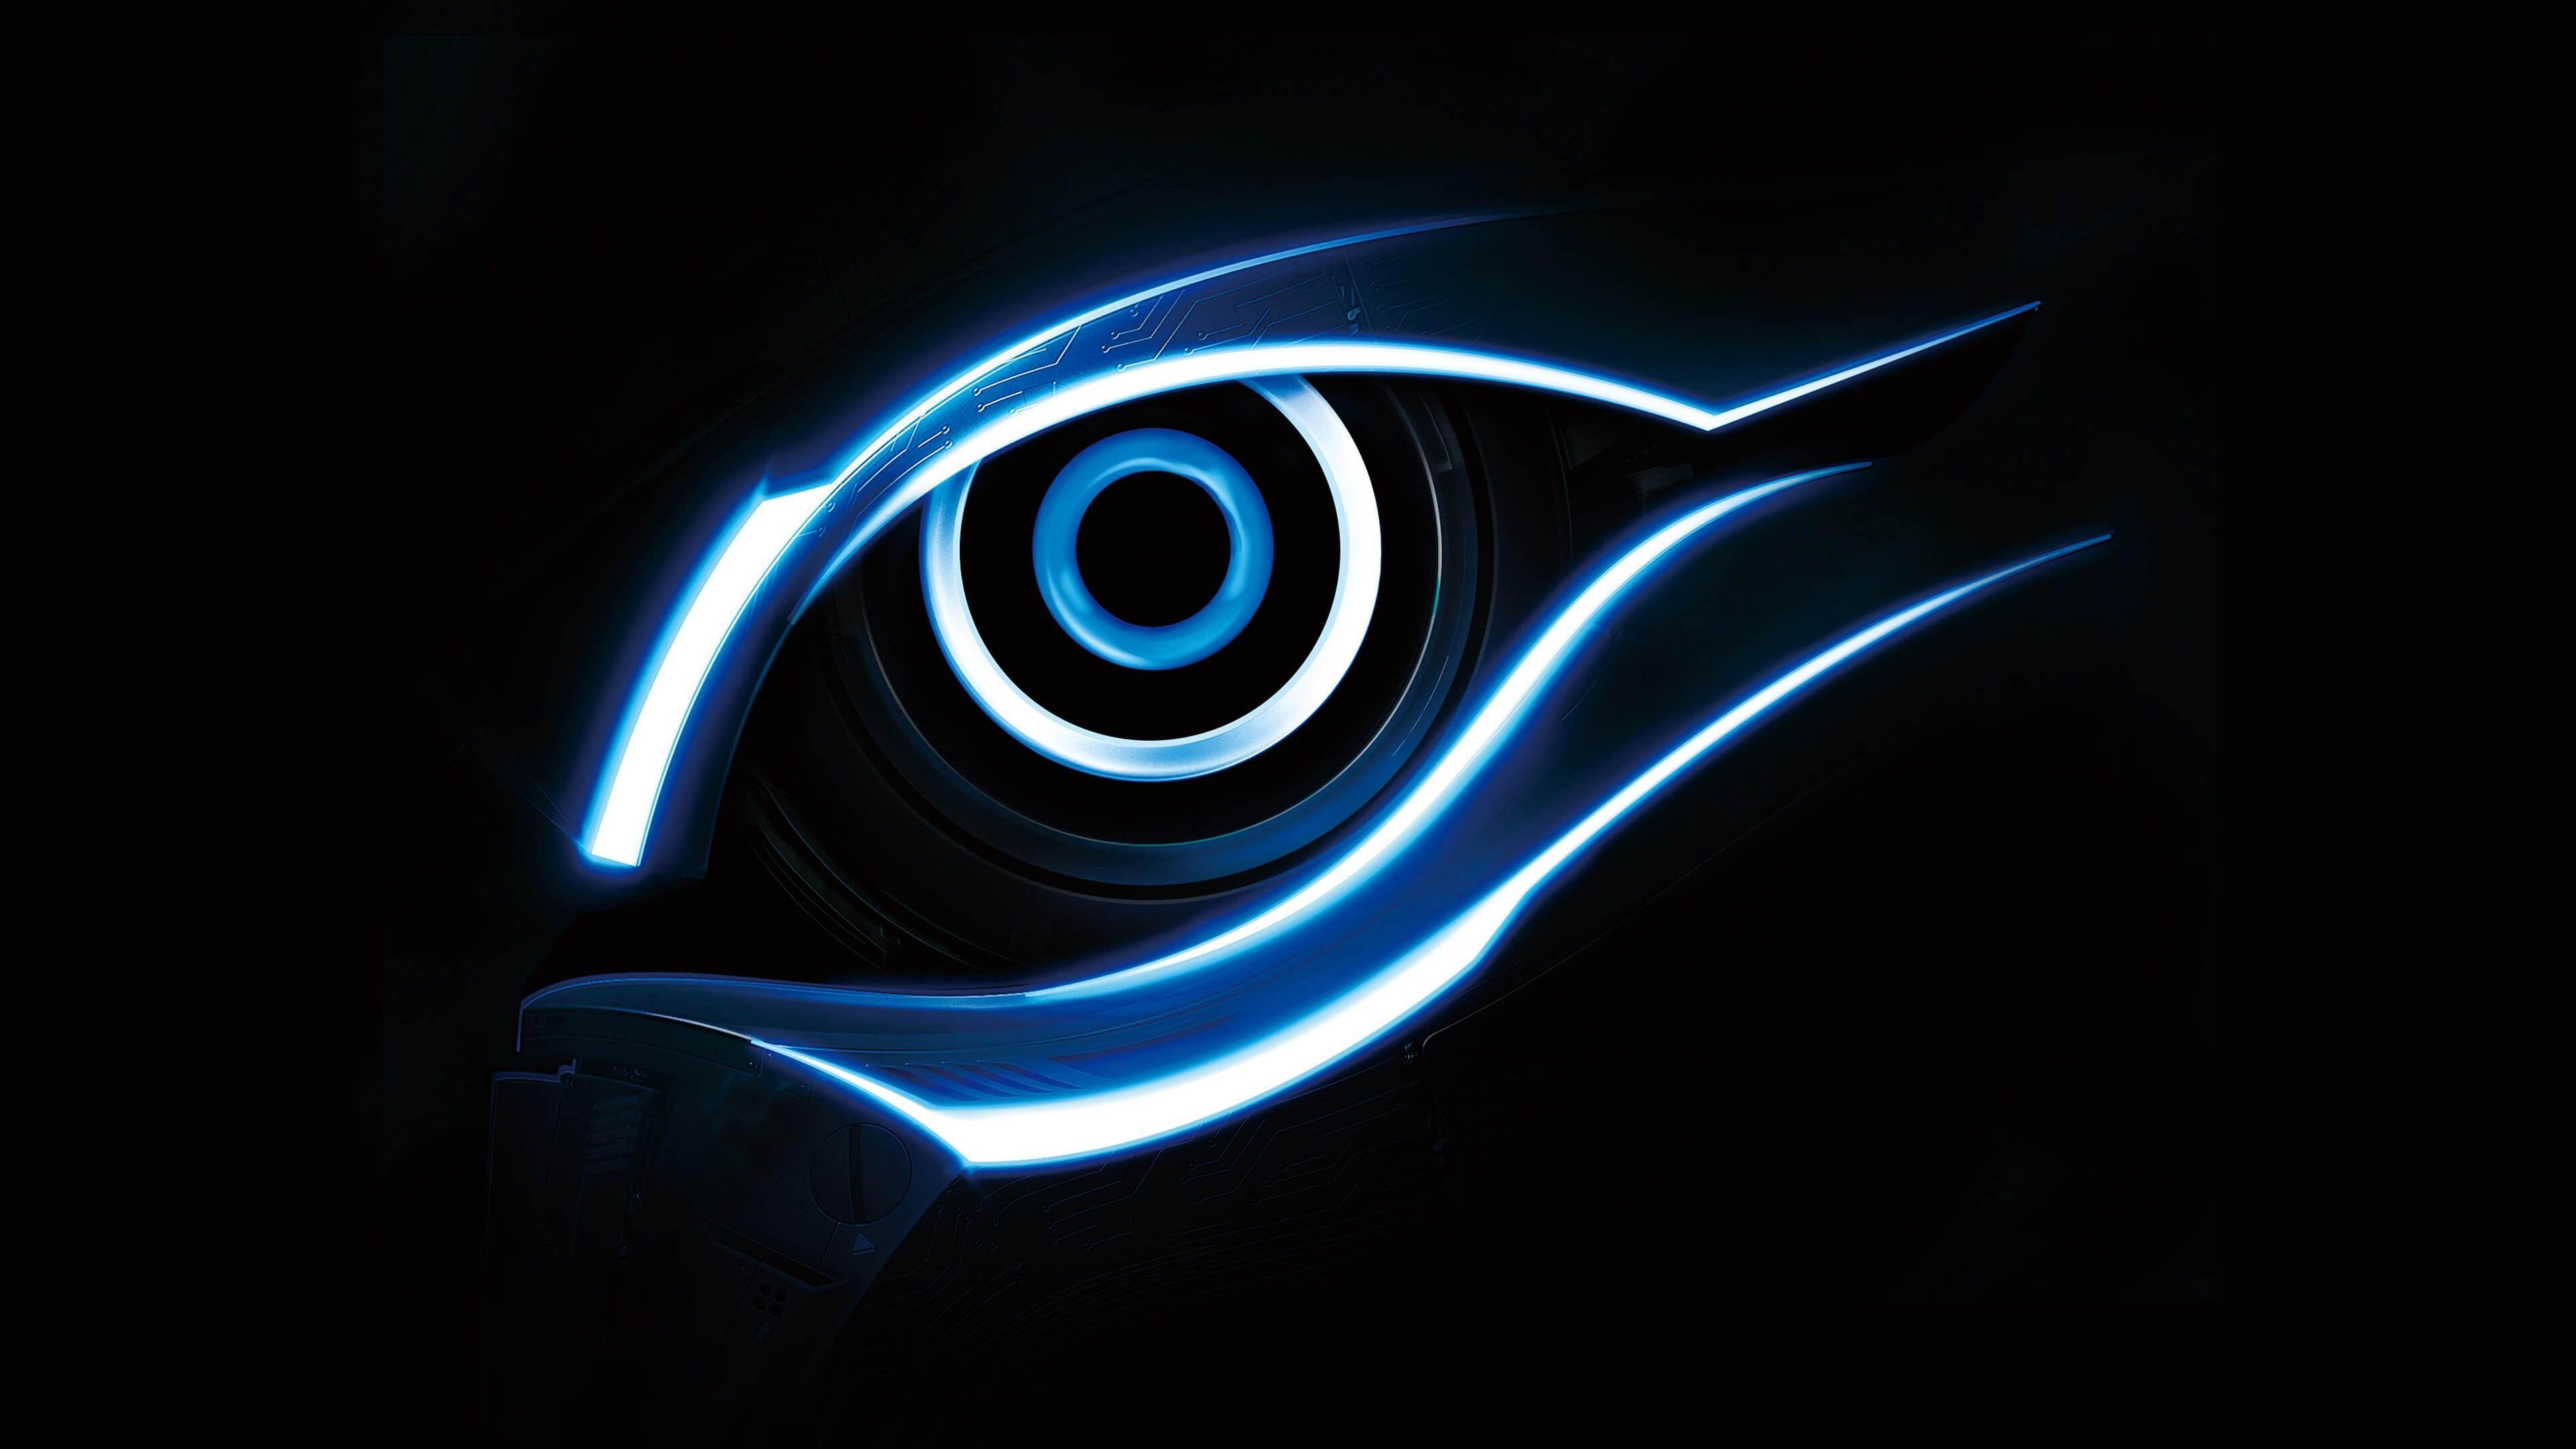 3840x2160 Ultra HD 4K Blue Gigabyte Eye Logo Wallpaper Download